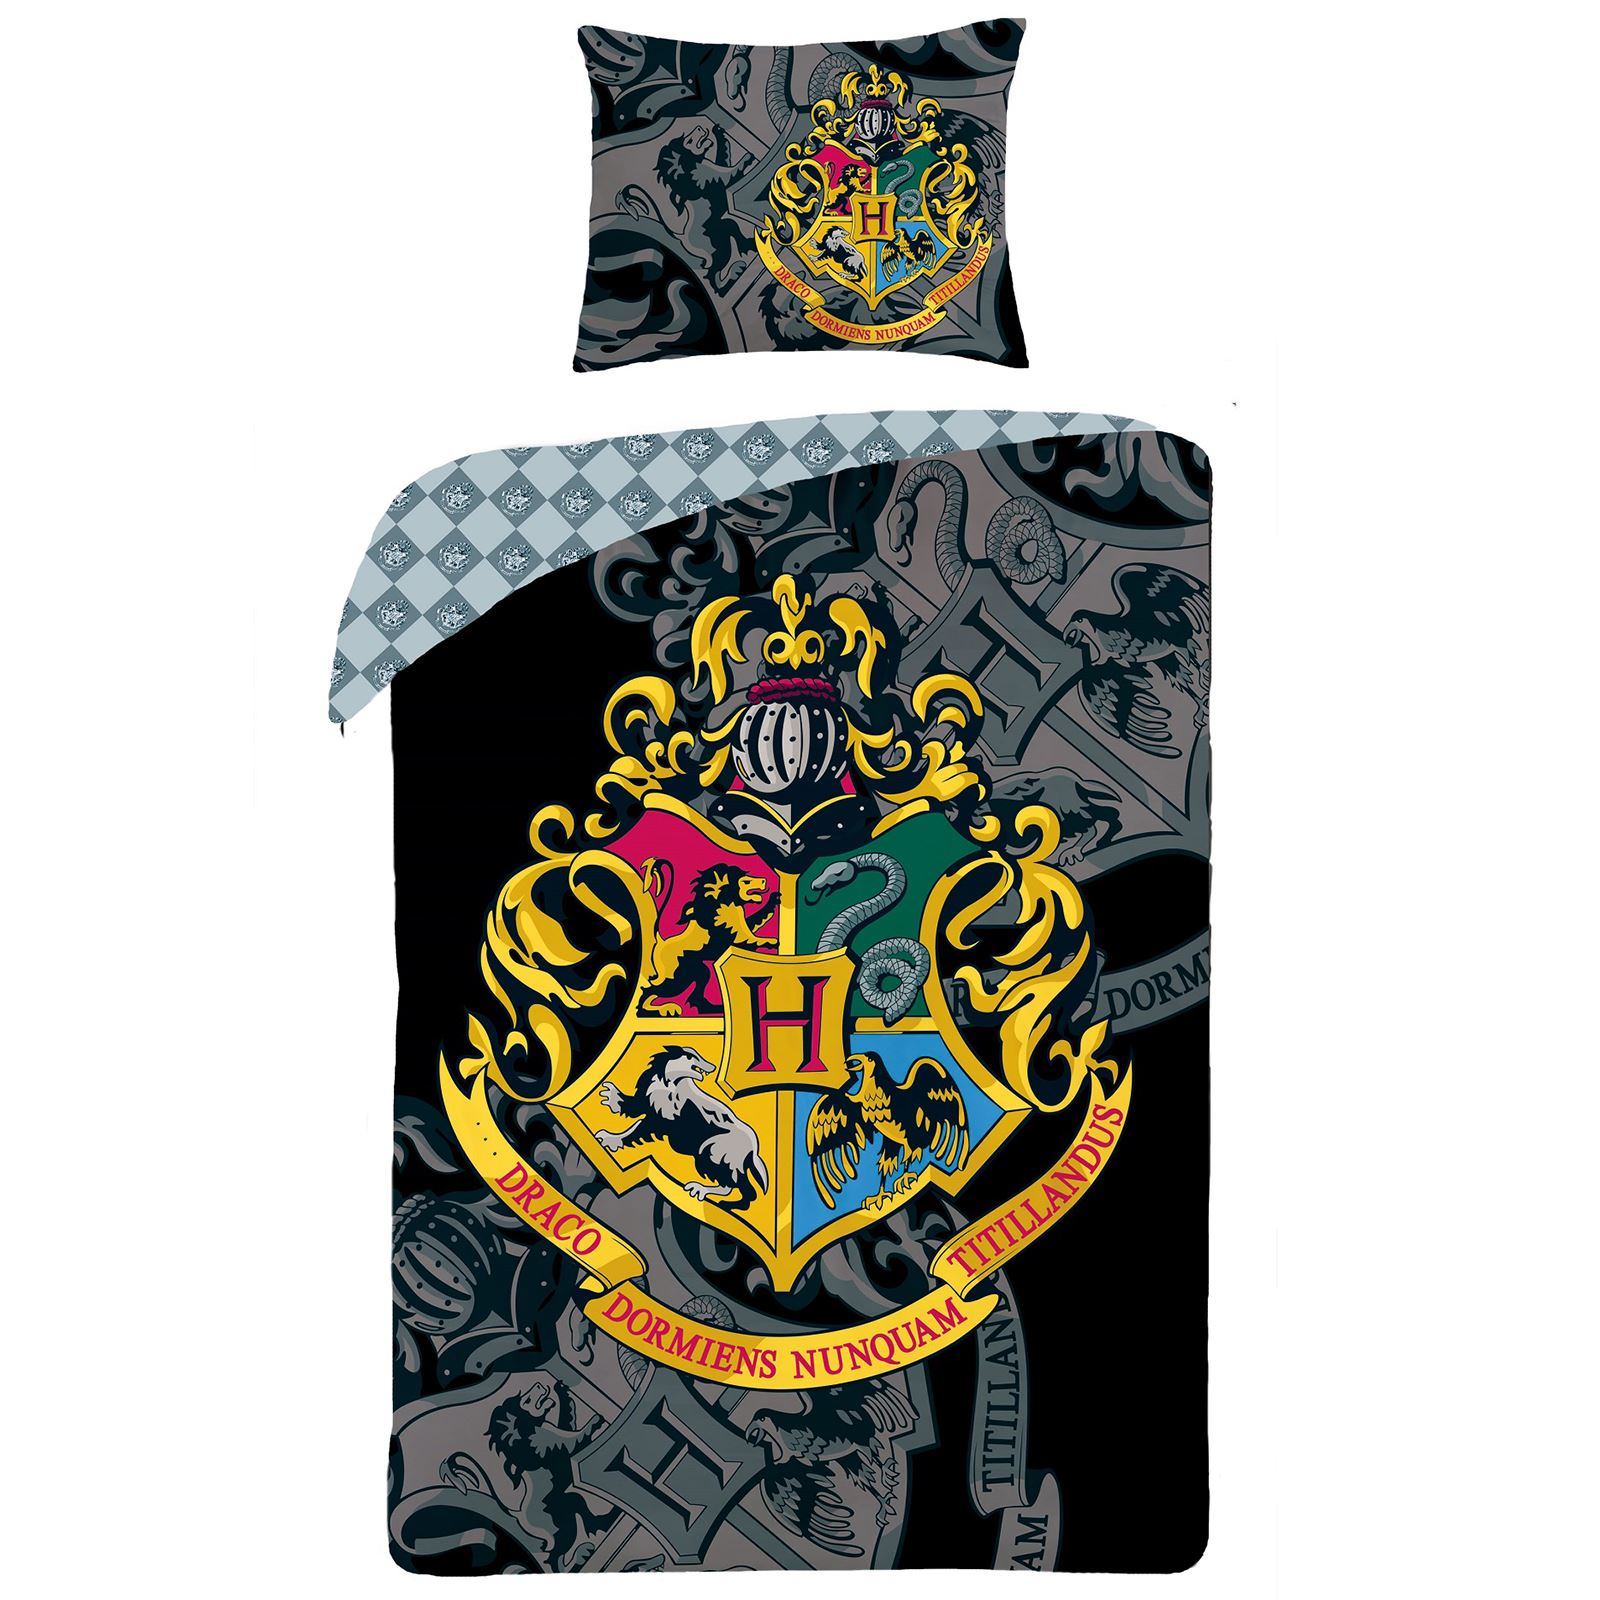 Ragazzi-Copripiumino-per-Letto-Singolo-Set-Paw-Patrol-Pj-Masks-Harry-Potter